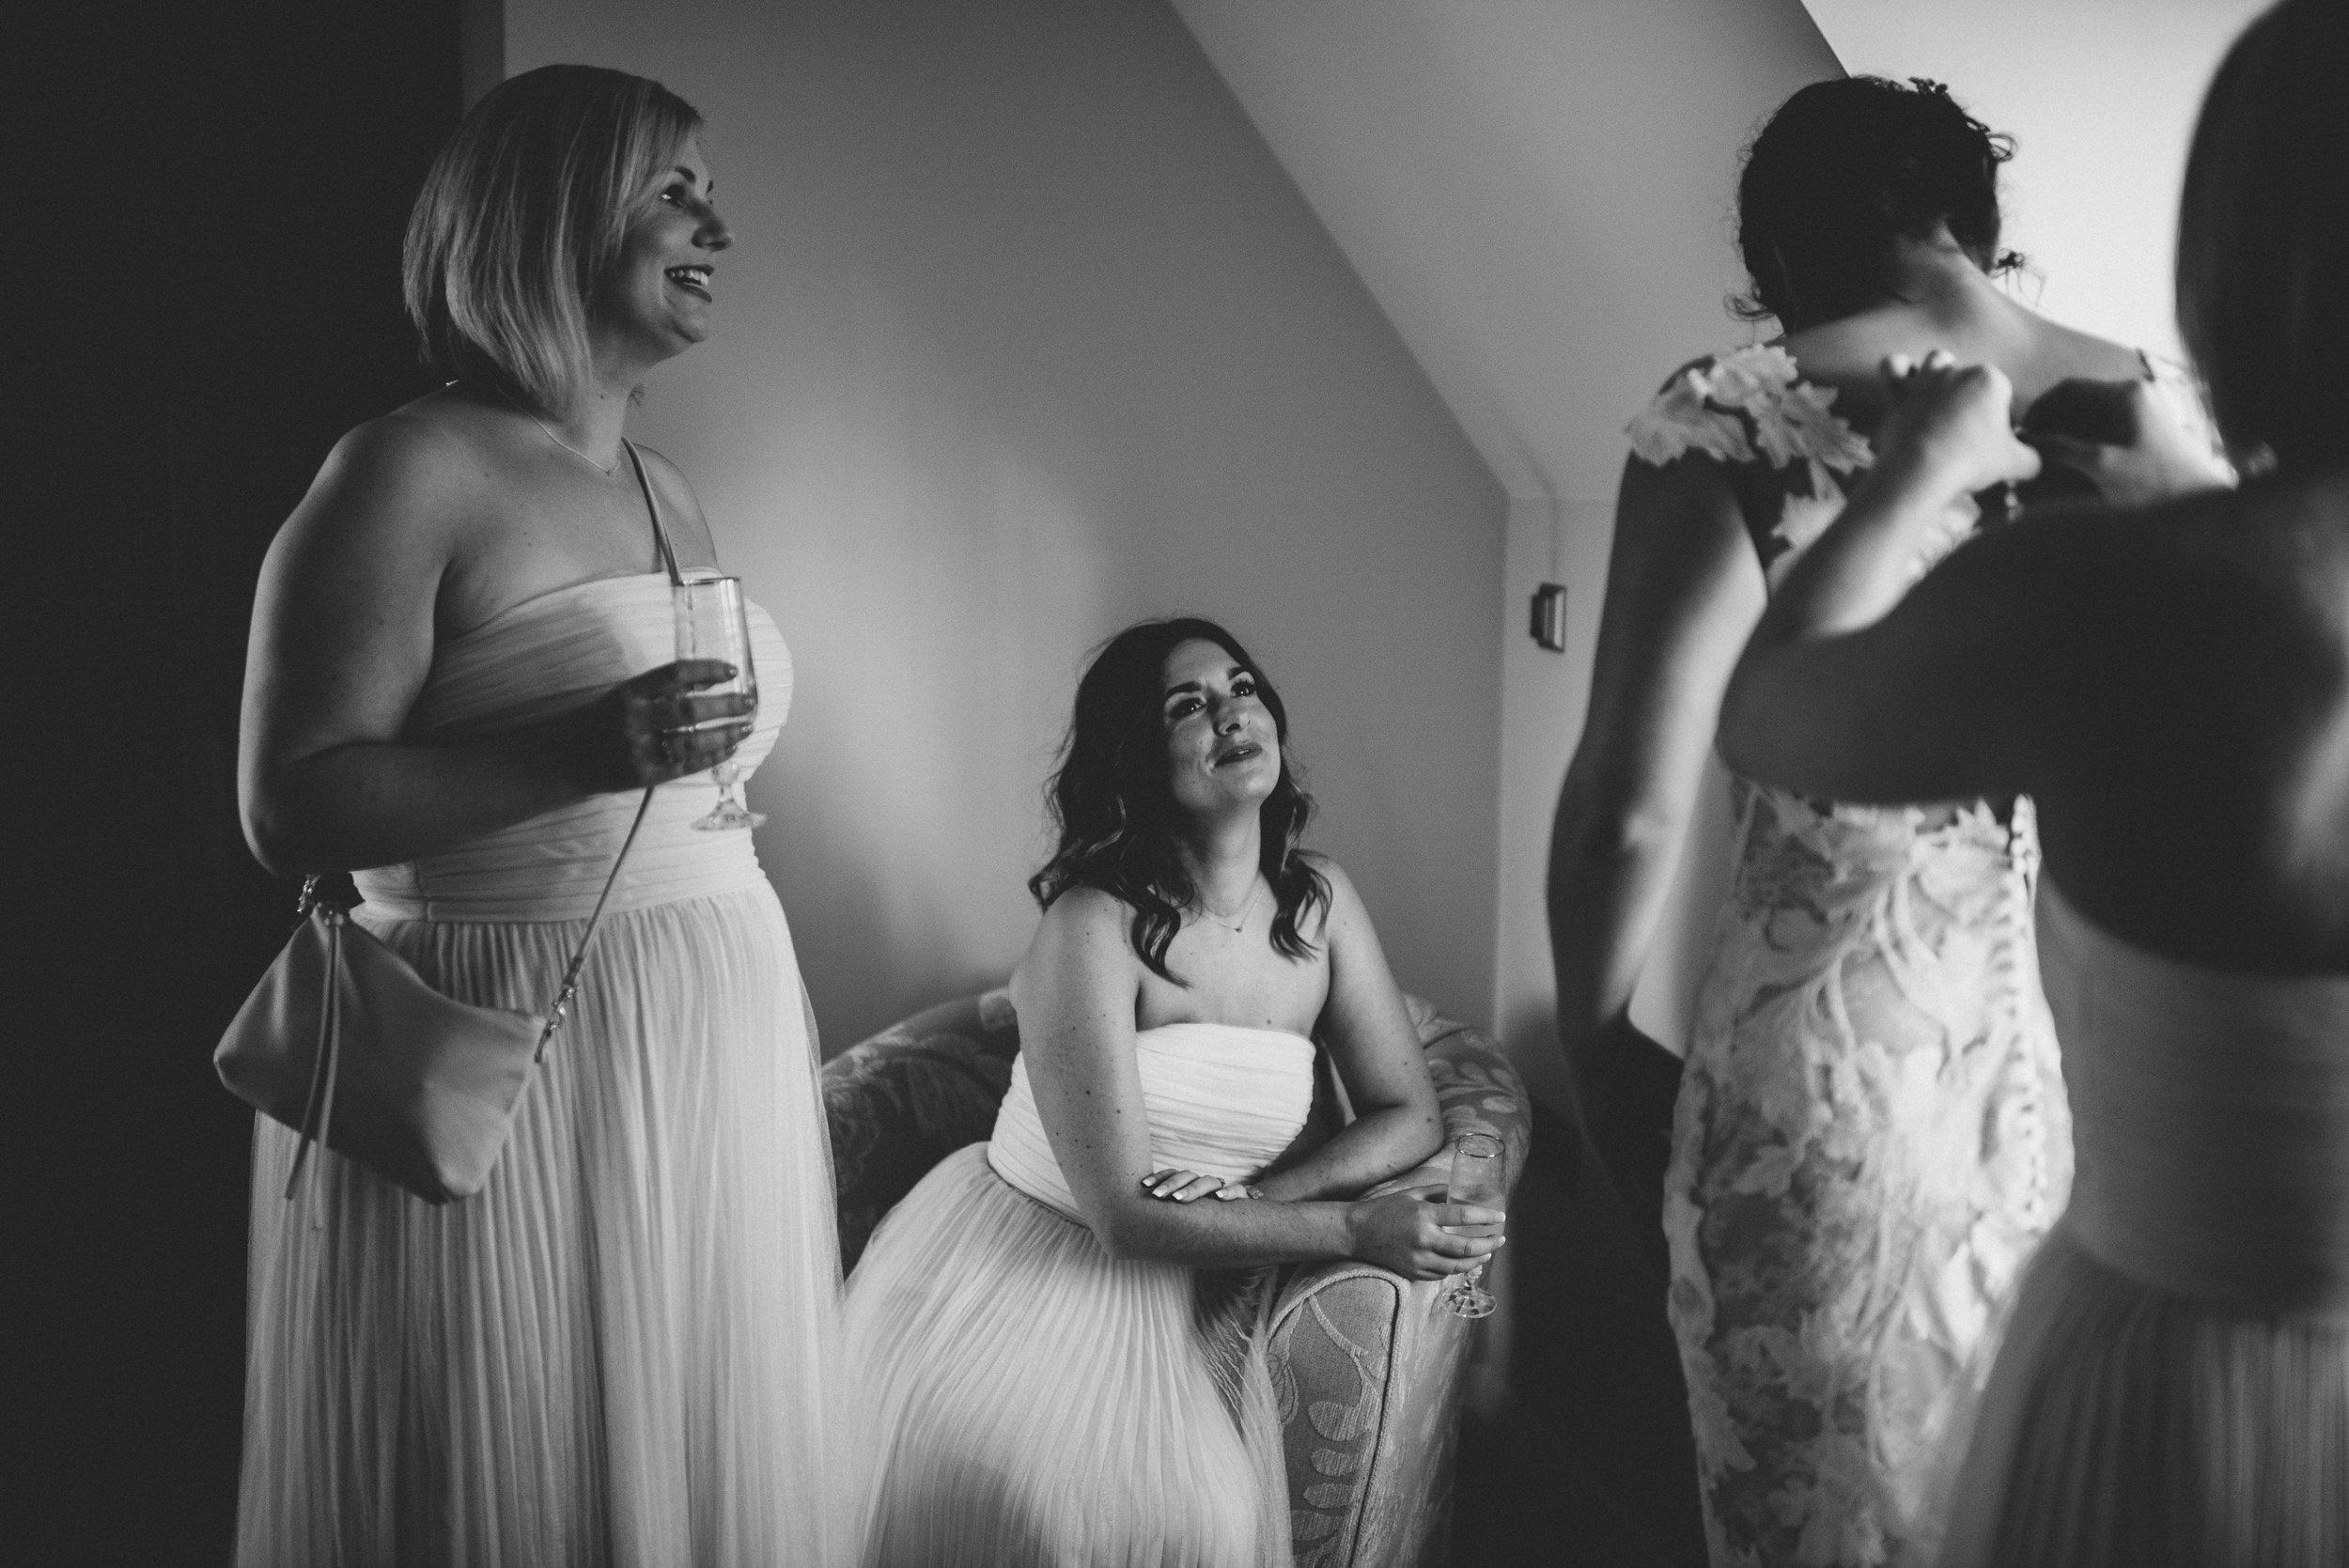 0074-LISA-DEVINE-PHOTOGRAPHY-ALTERNATIVE-WEDDING-PHOTOGRAPHY-SCOTLAND-DESTINATION-WEDDINGS-GLASGOW-WEDDINGS-COOL-WEDDINGS-STYLISH-WEDDINGS.JPG